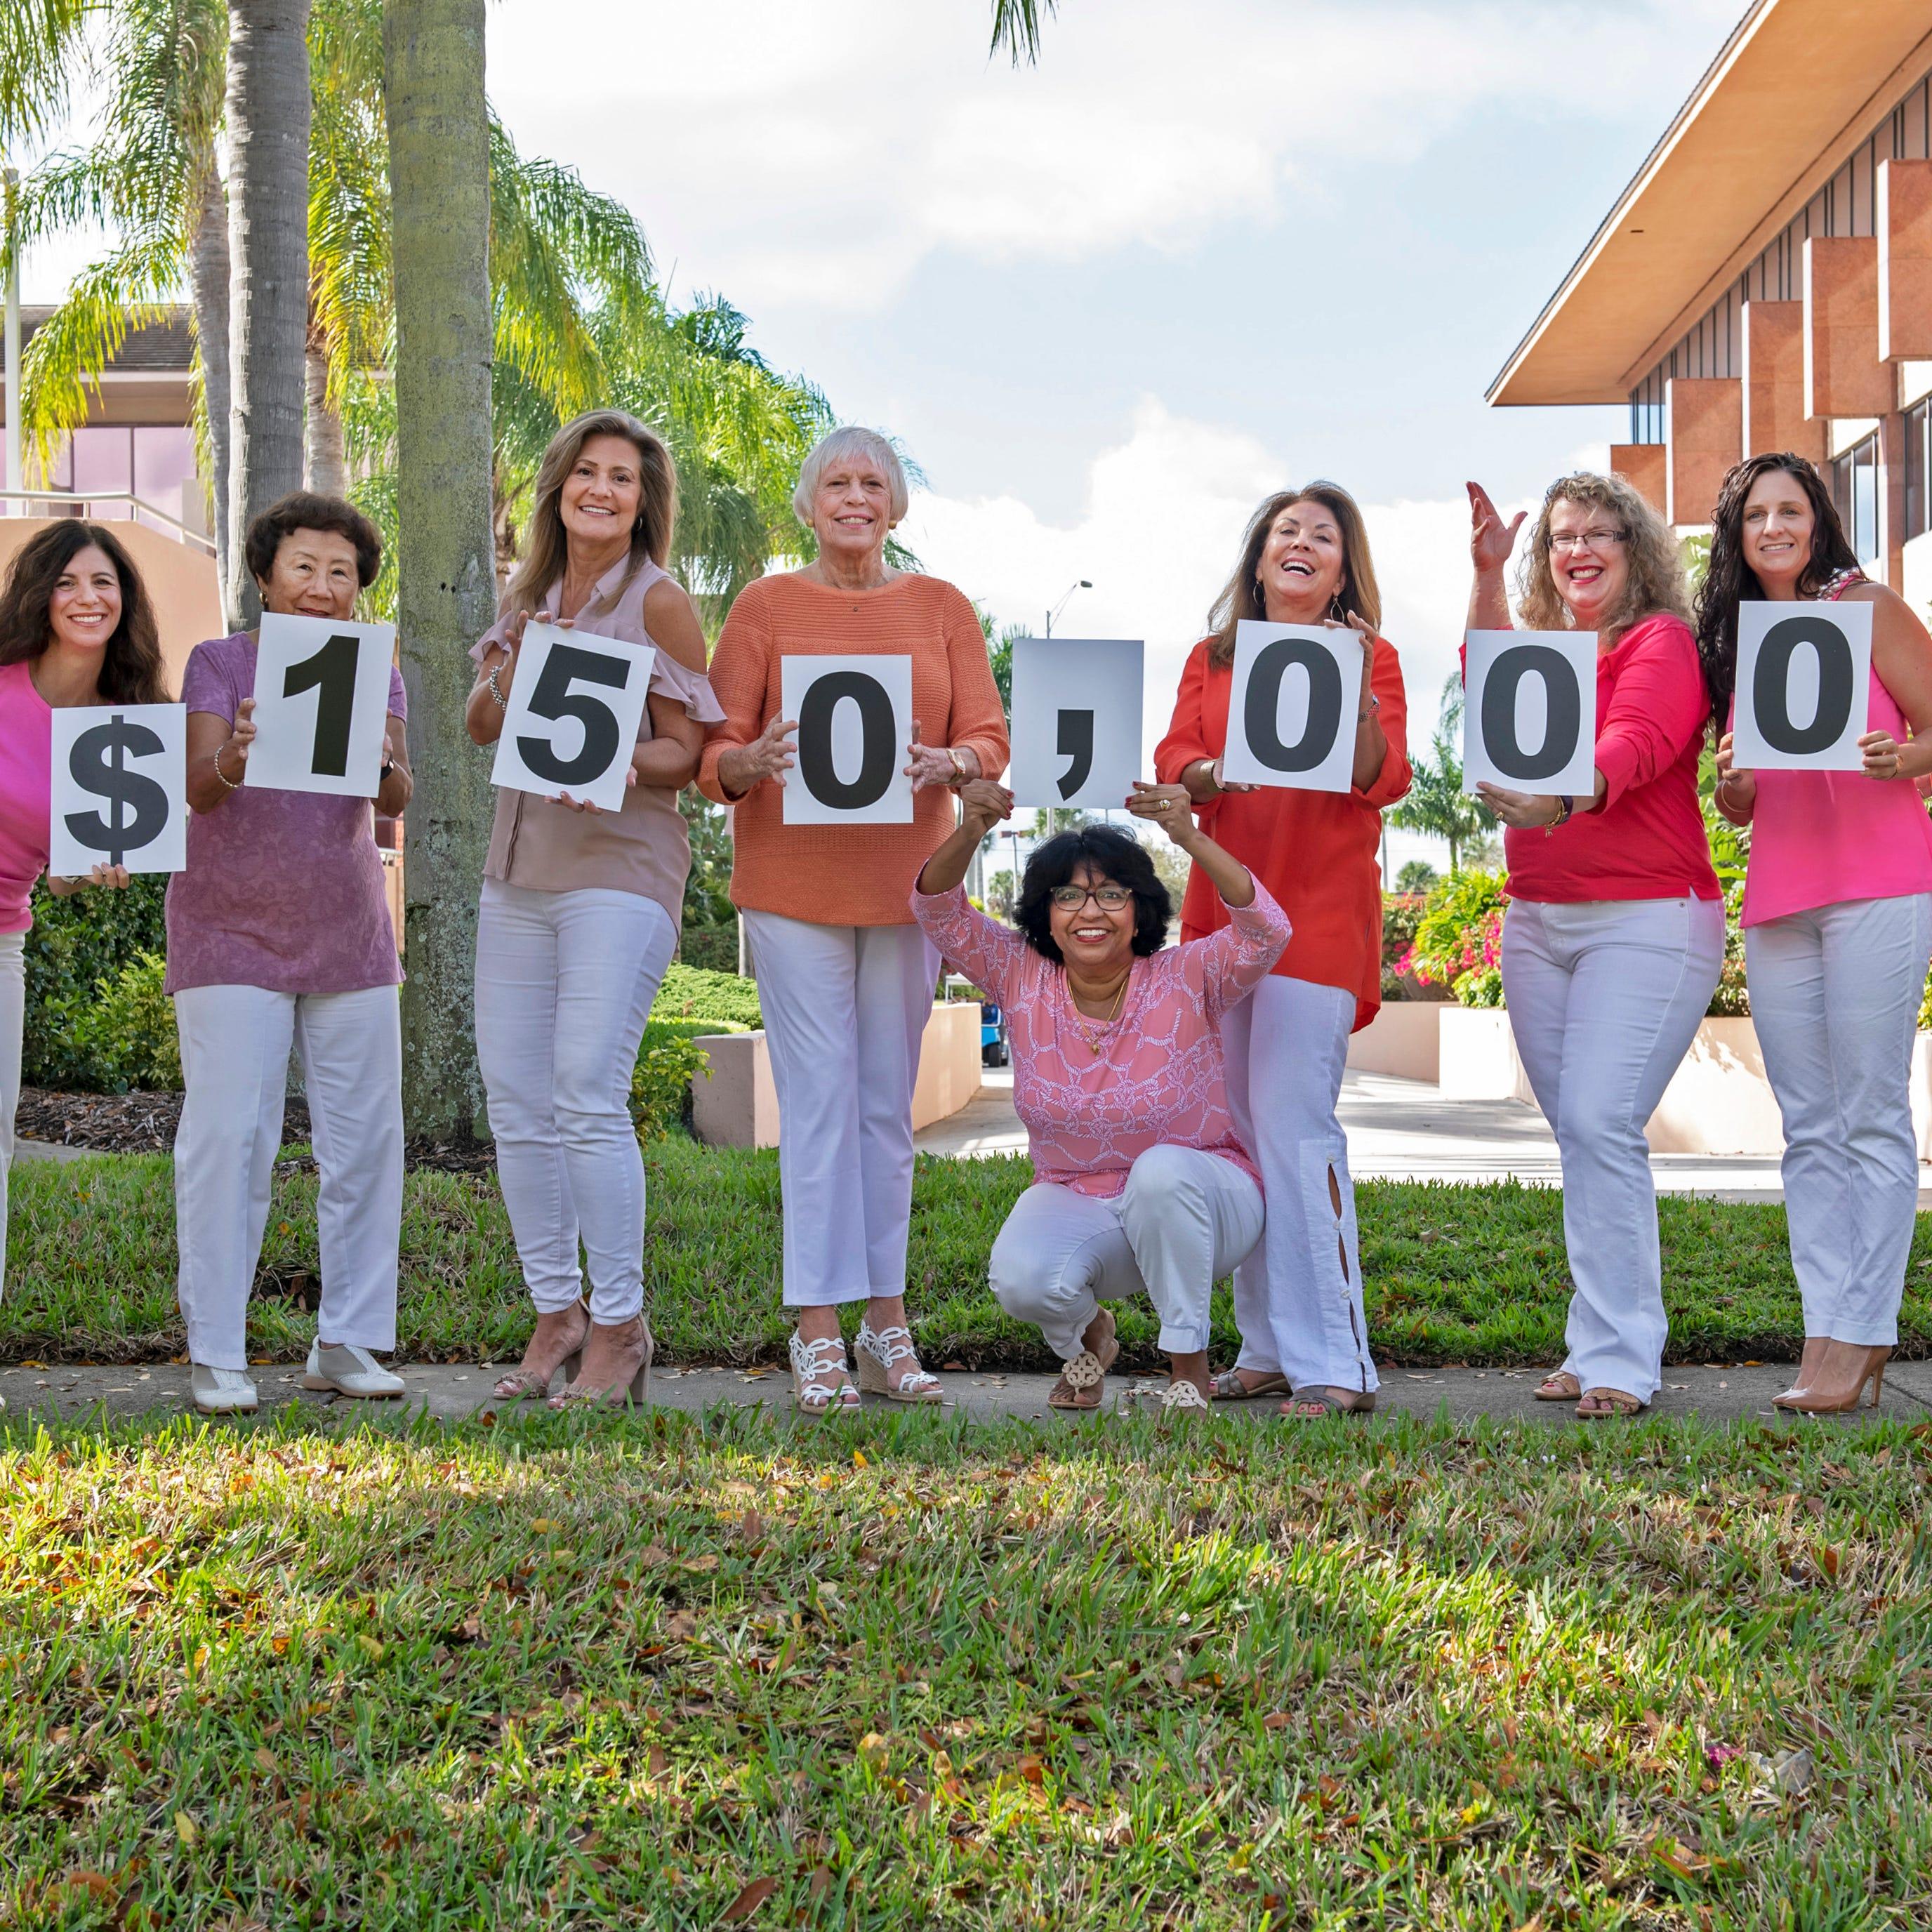 Impact 100 Martin to award $150,000 in grants on April 11